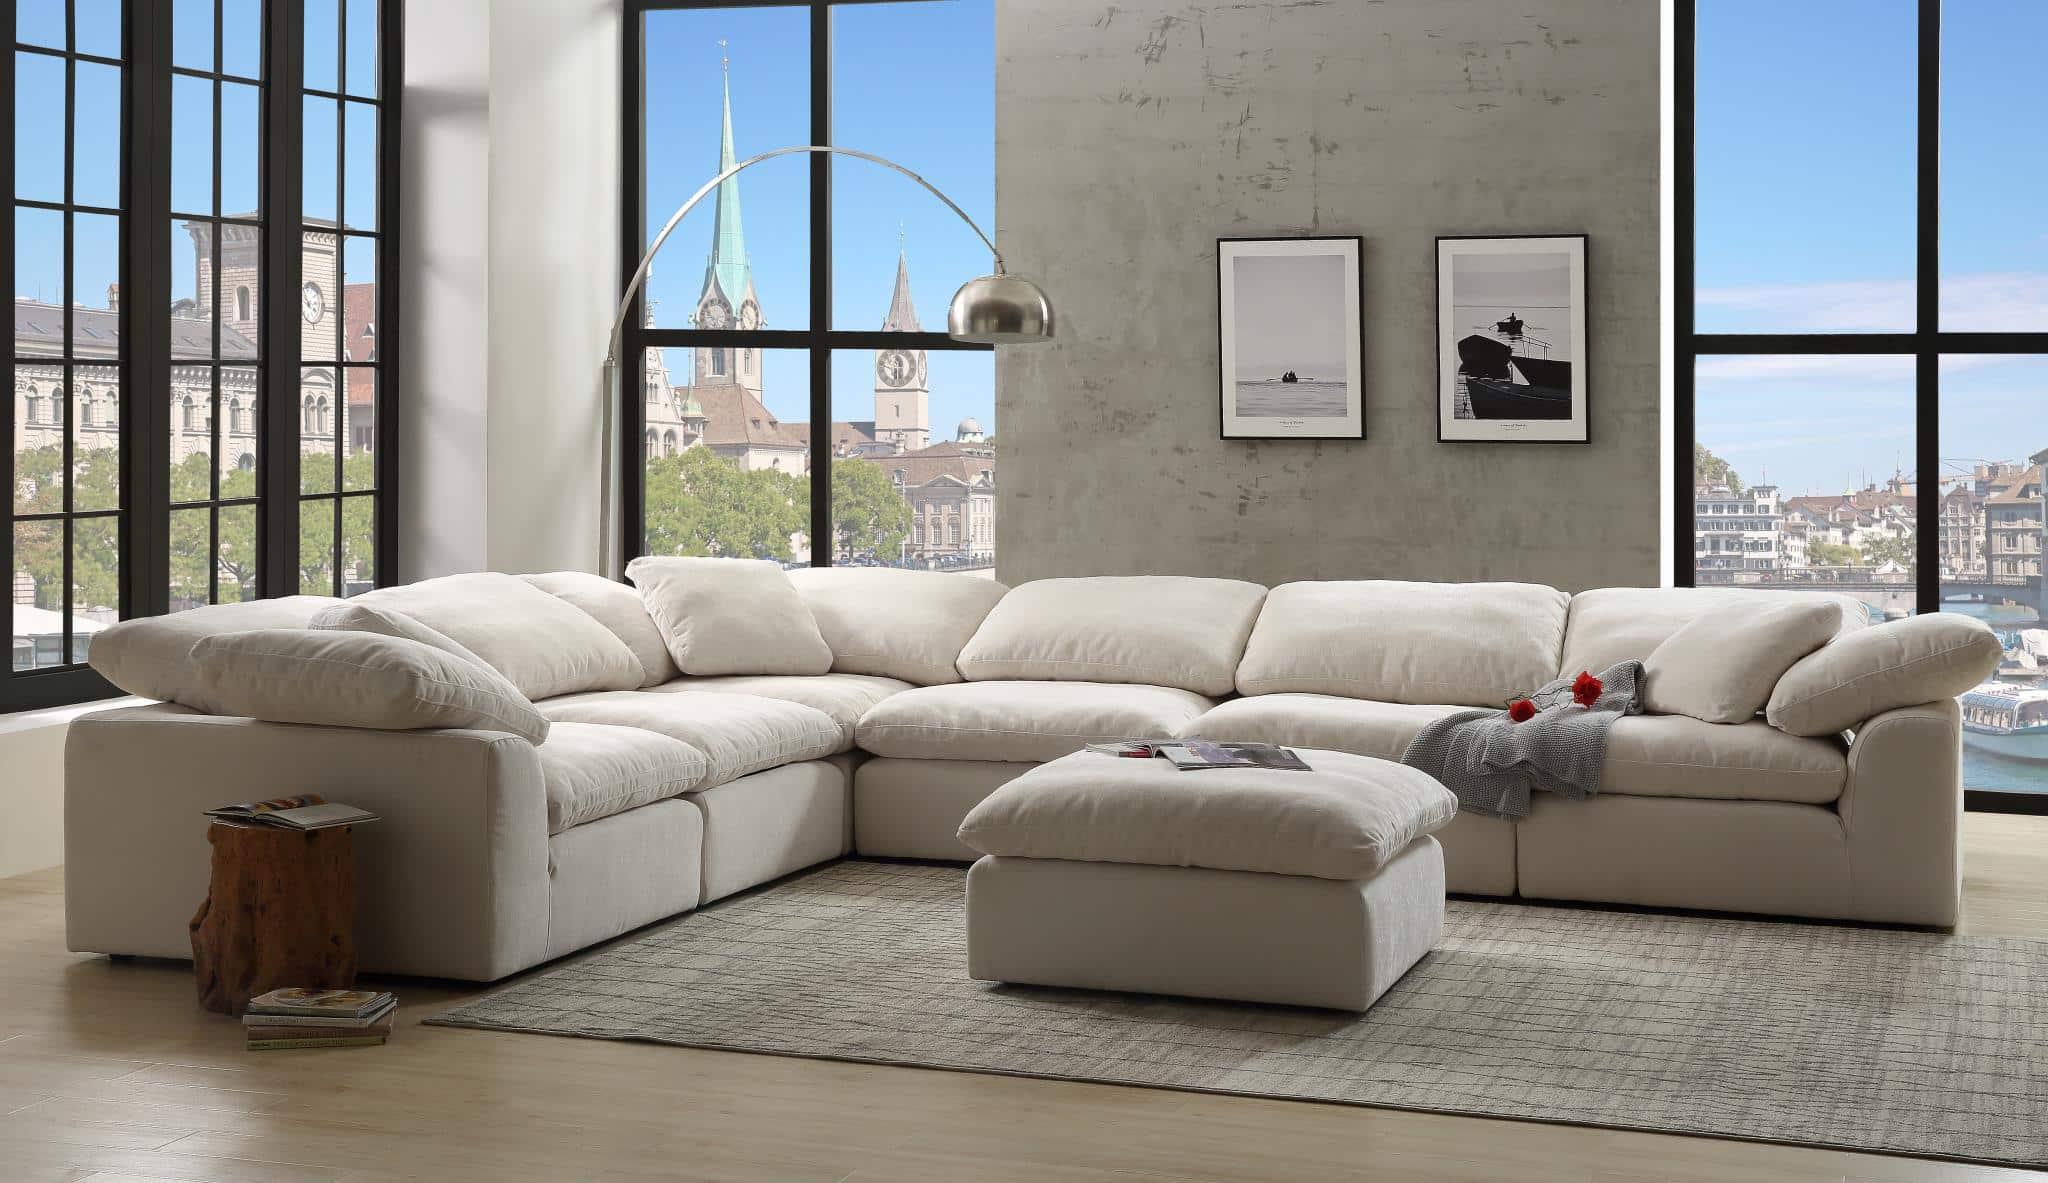 Naveen Ivory Linen Modular Sectional Sofa   KFROOMS